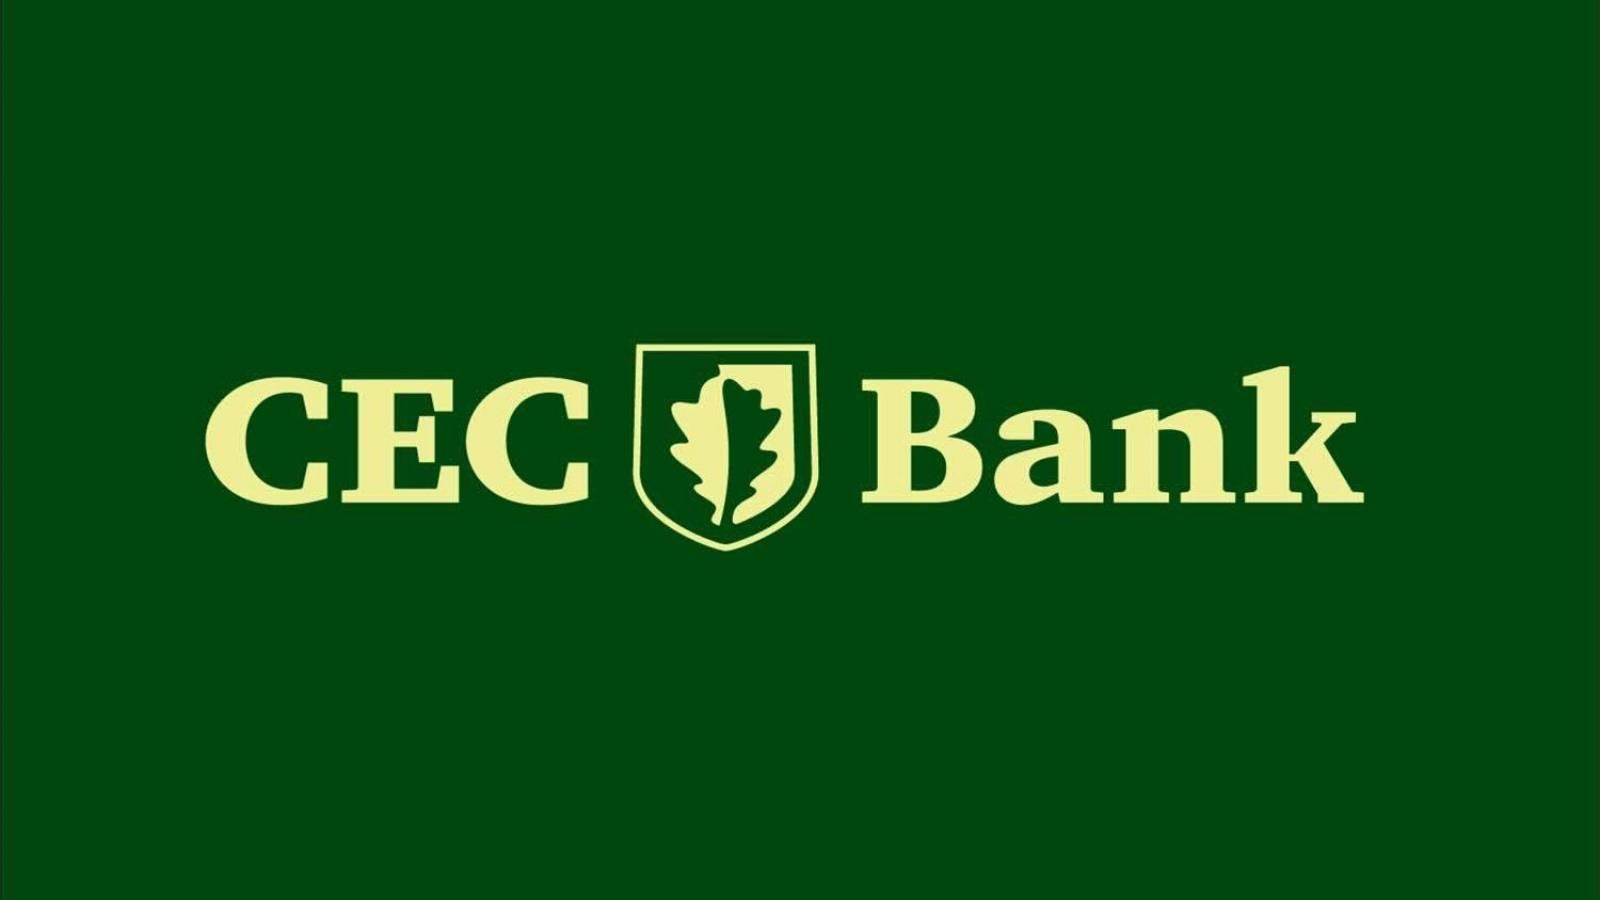 CEC Bank premii